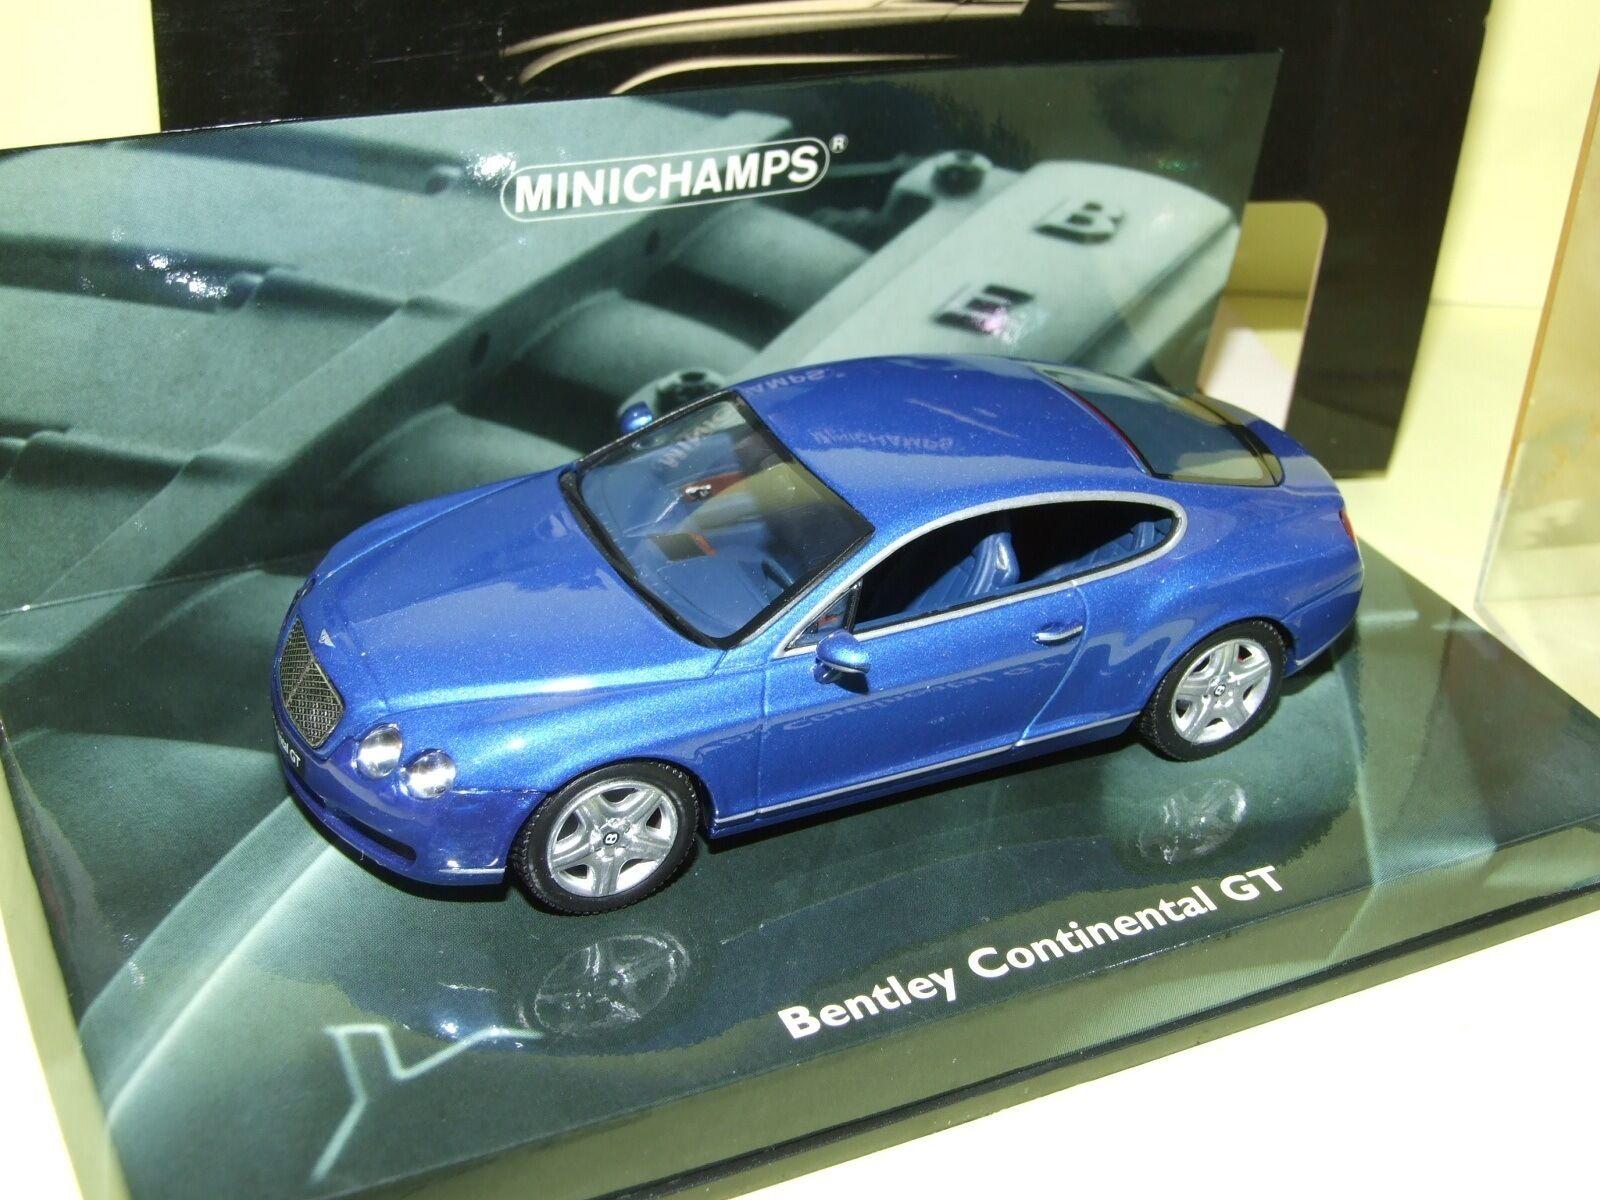 Blau bentley continental gt minichamps 1 43